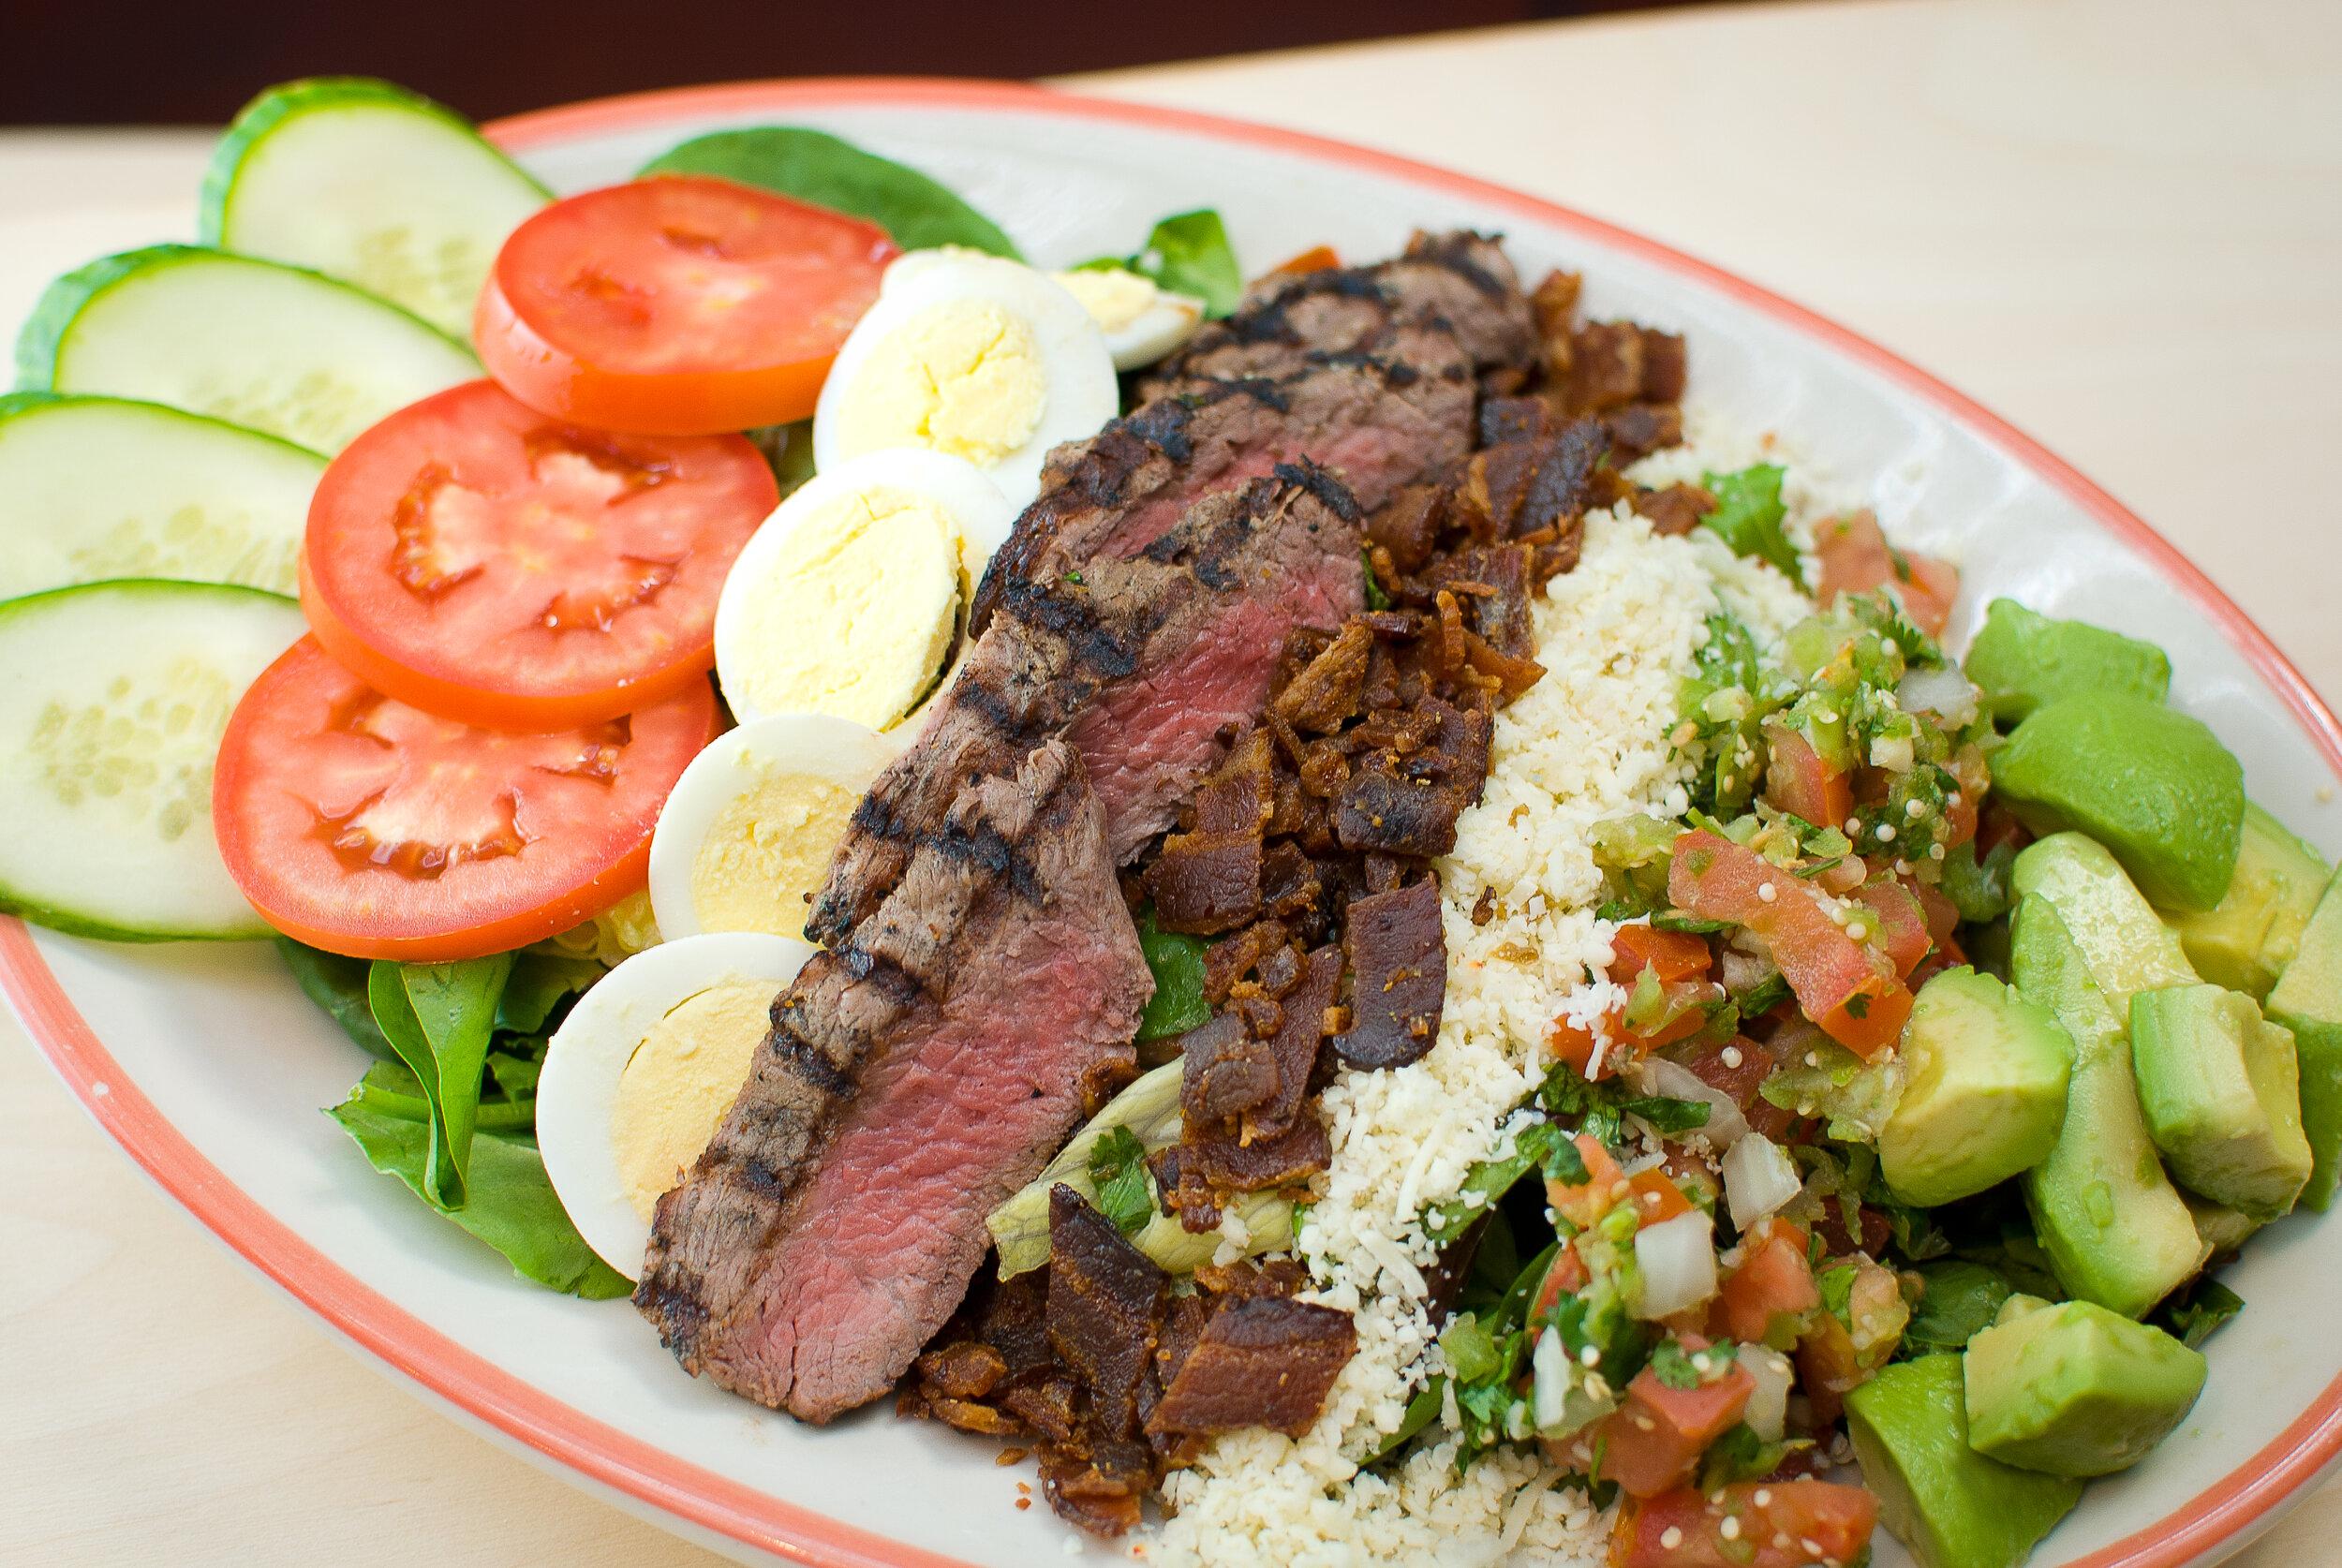 Southwestern Cobb Salad, Photo by Alisa Shelton.jpg